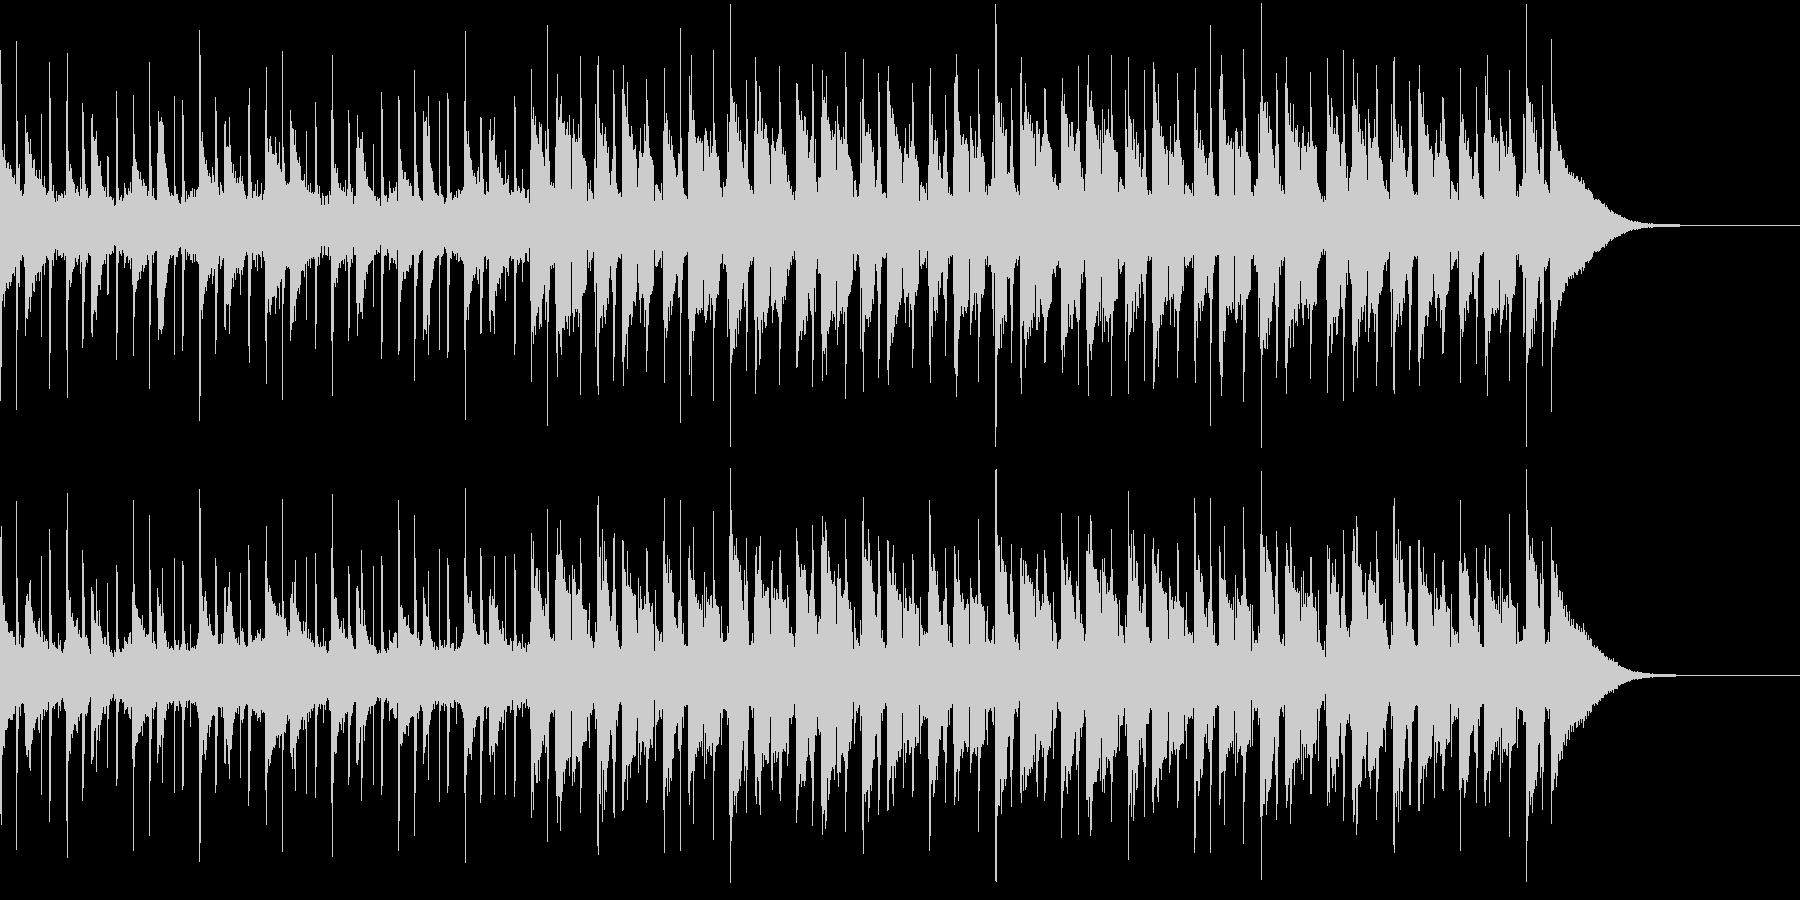 Pf「刻」和風現代ジャズの未再生の波形